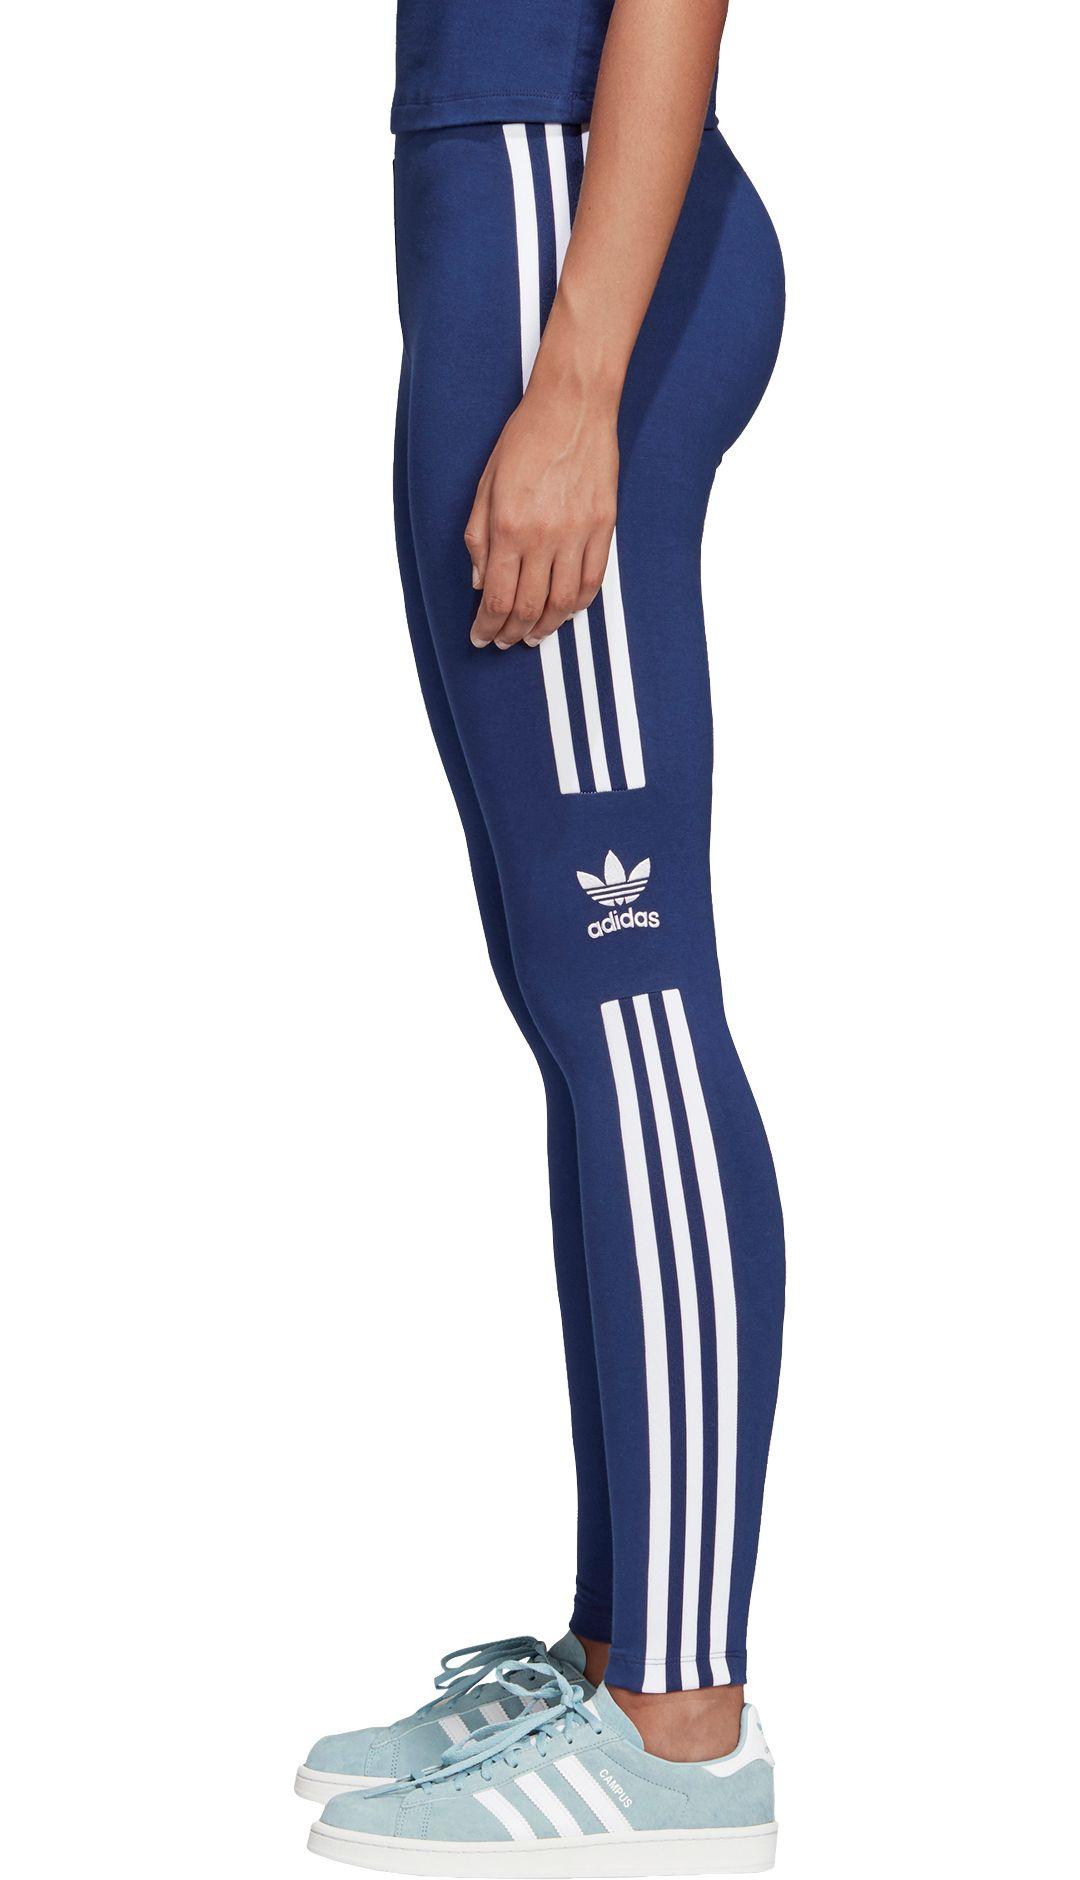 adidas originals high waist tight